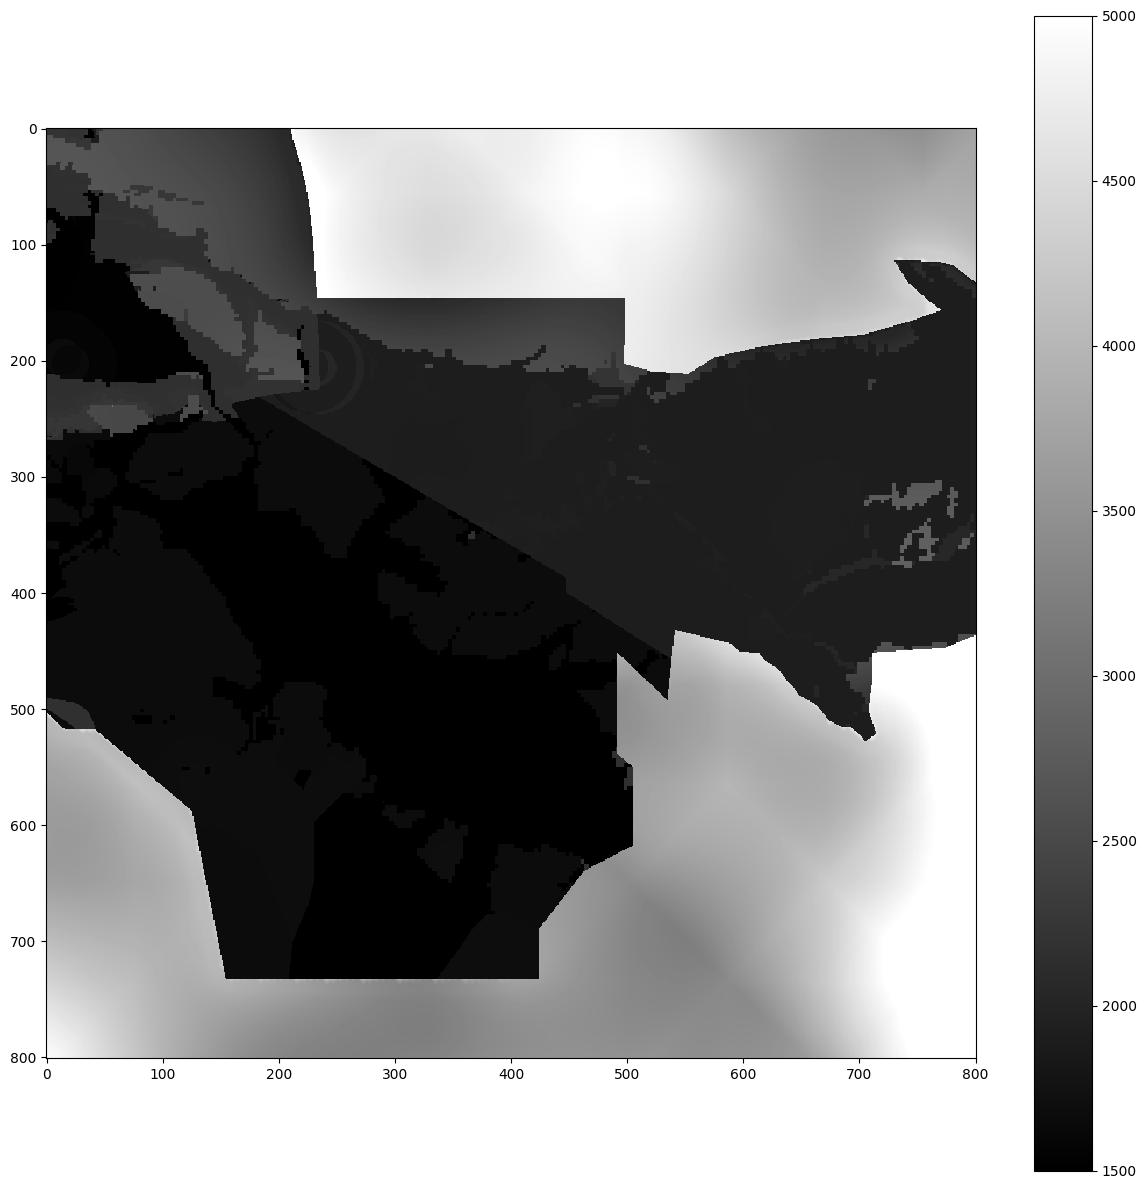 bench/seismic/wp/la_habra/meshes/velocity_model/plots/vp_50.png